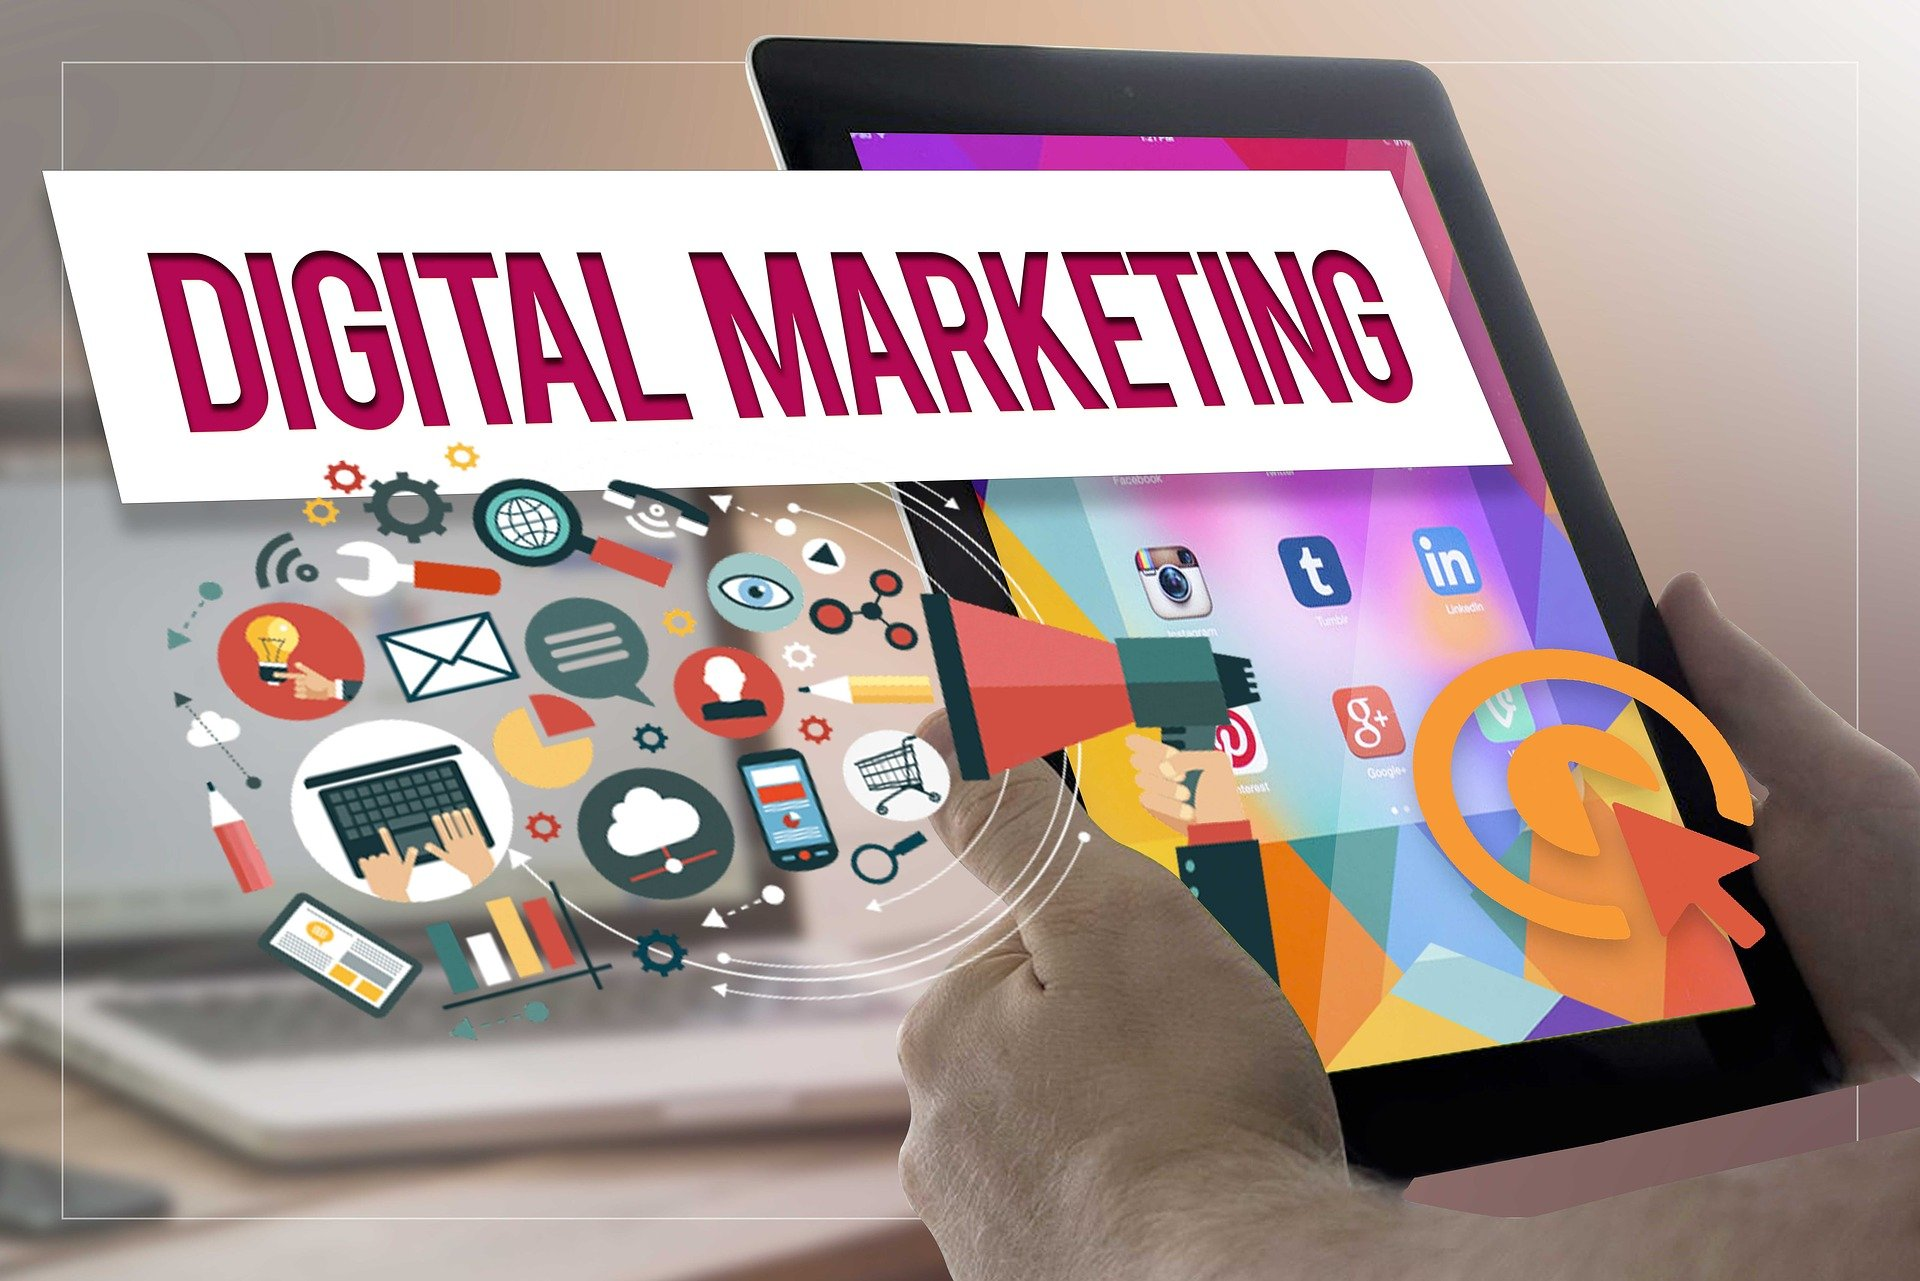 Digital Marketing Fundamentals Professional Certificate | edX